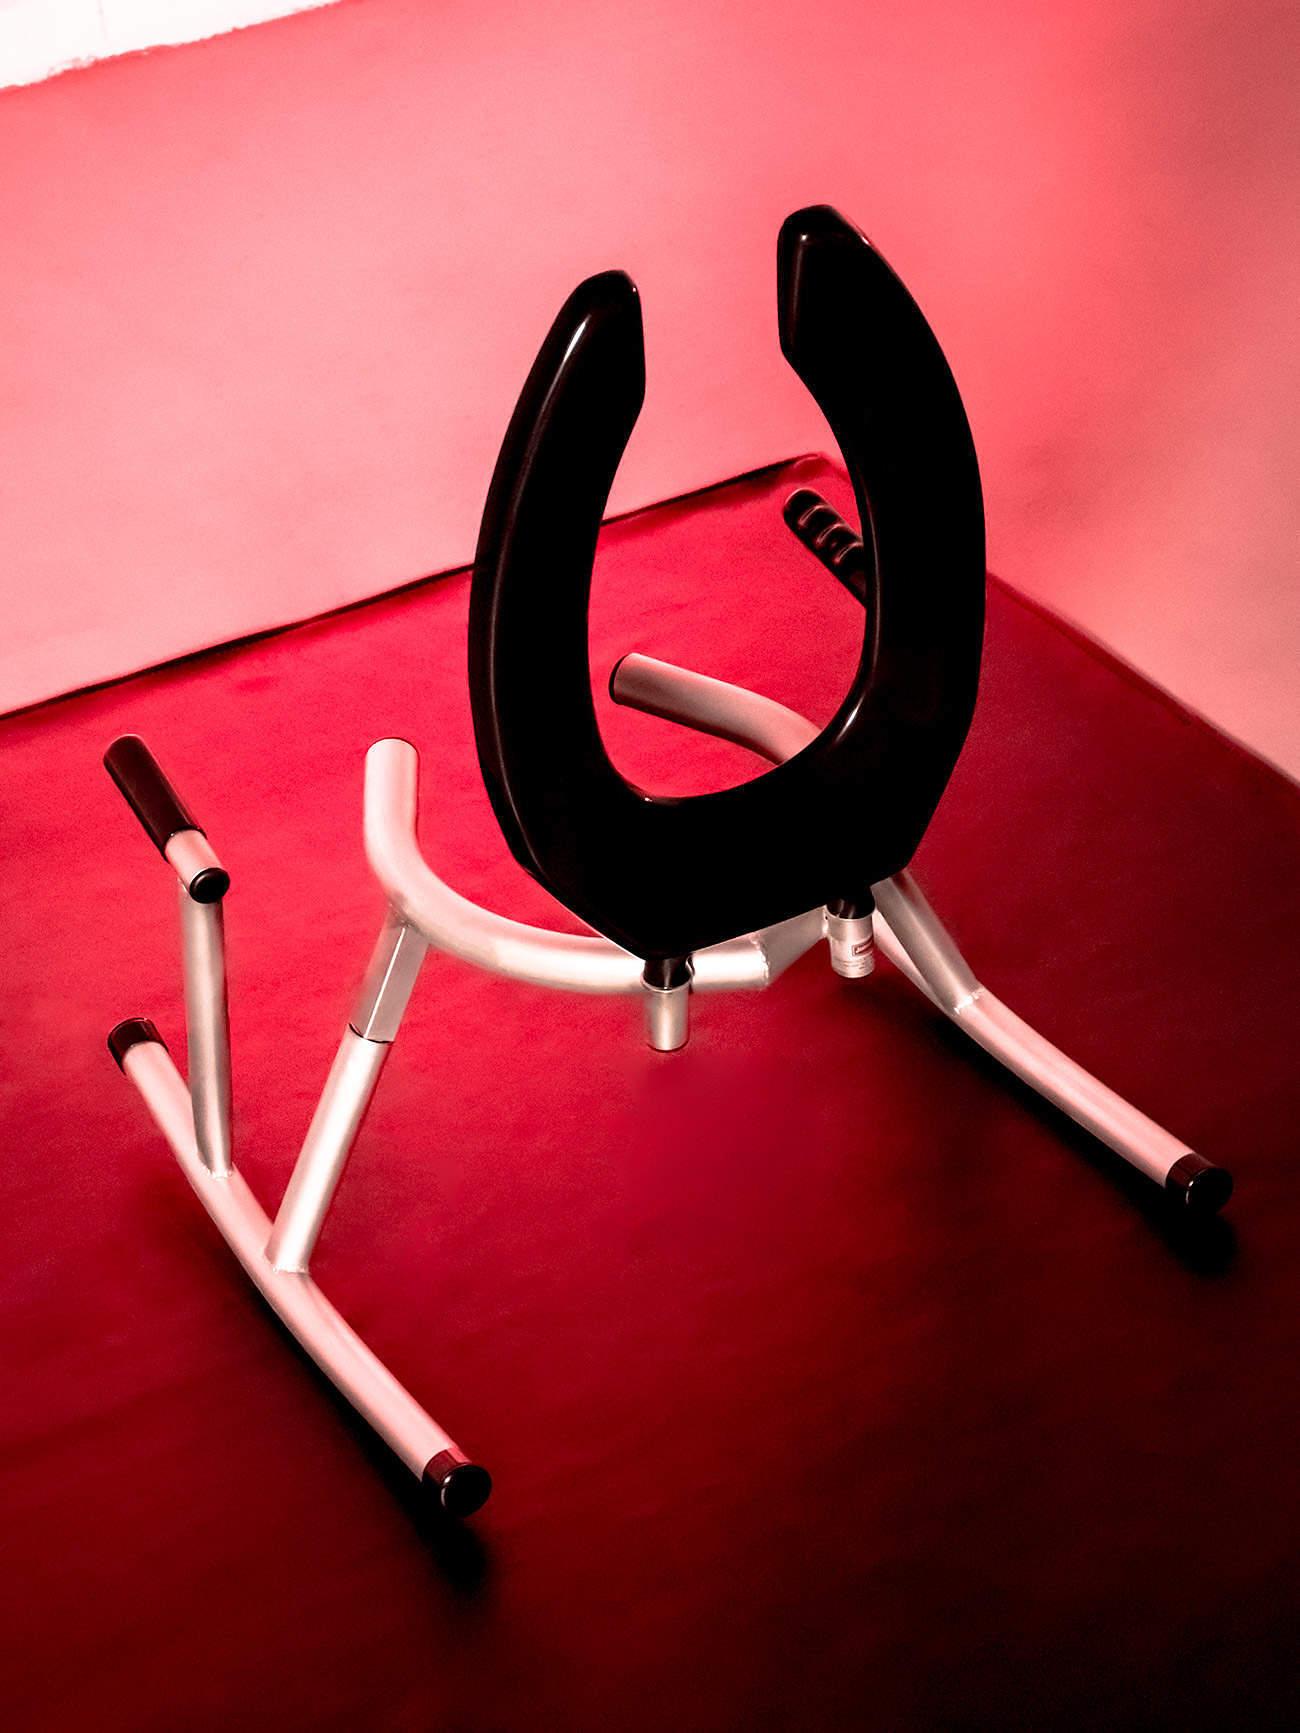 JimSupport Rim Rocker Rim Seat, Rear View